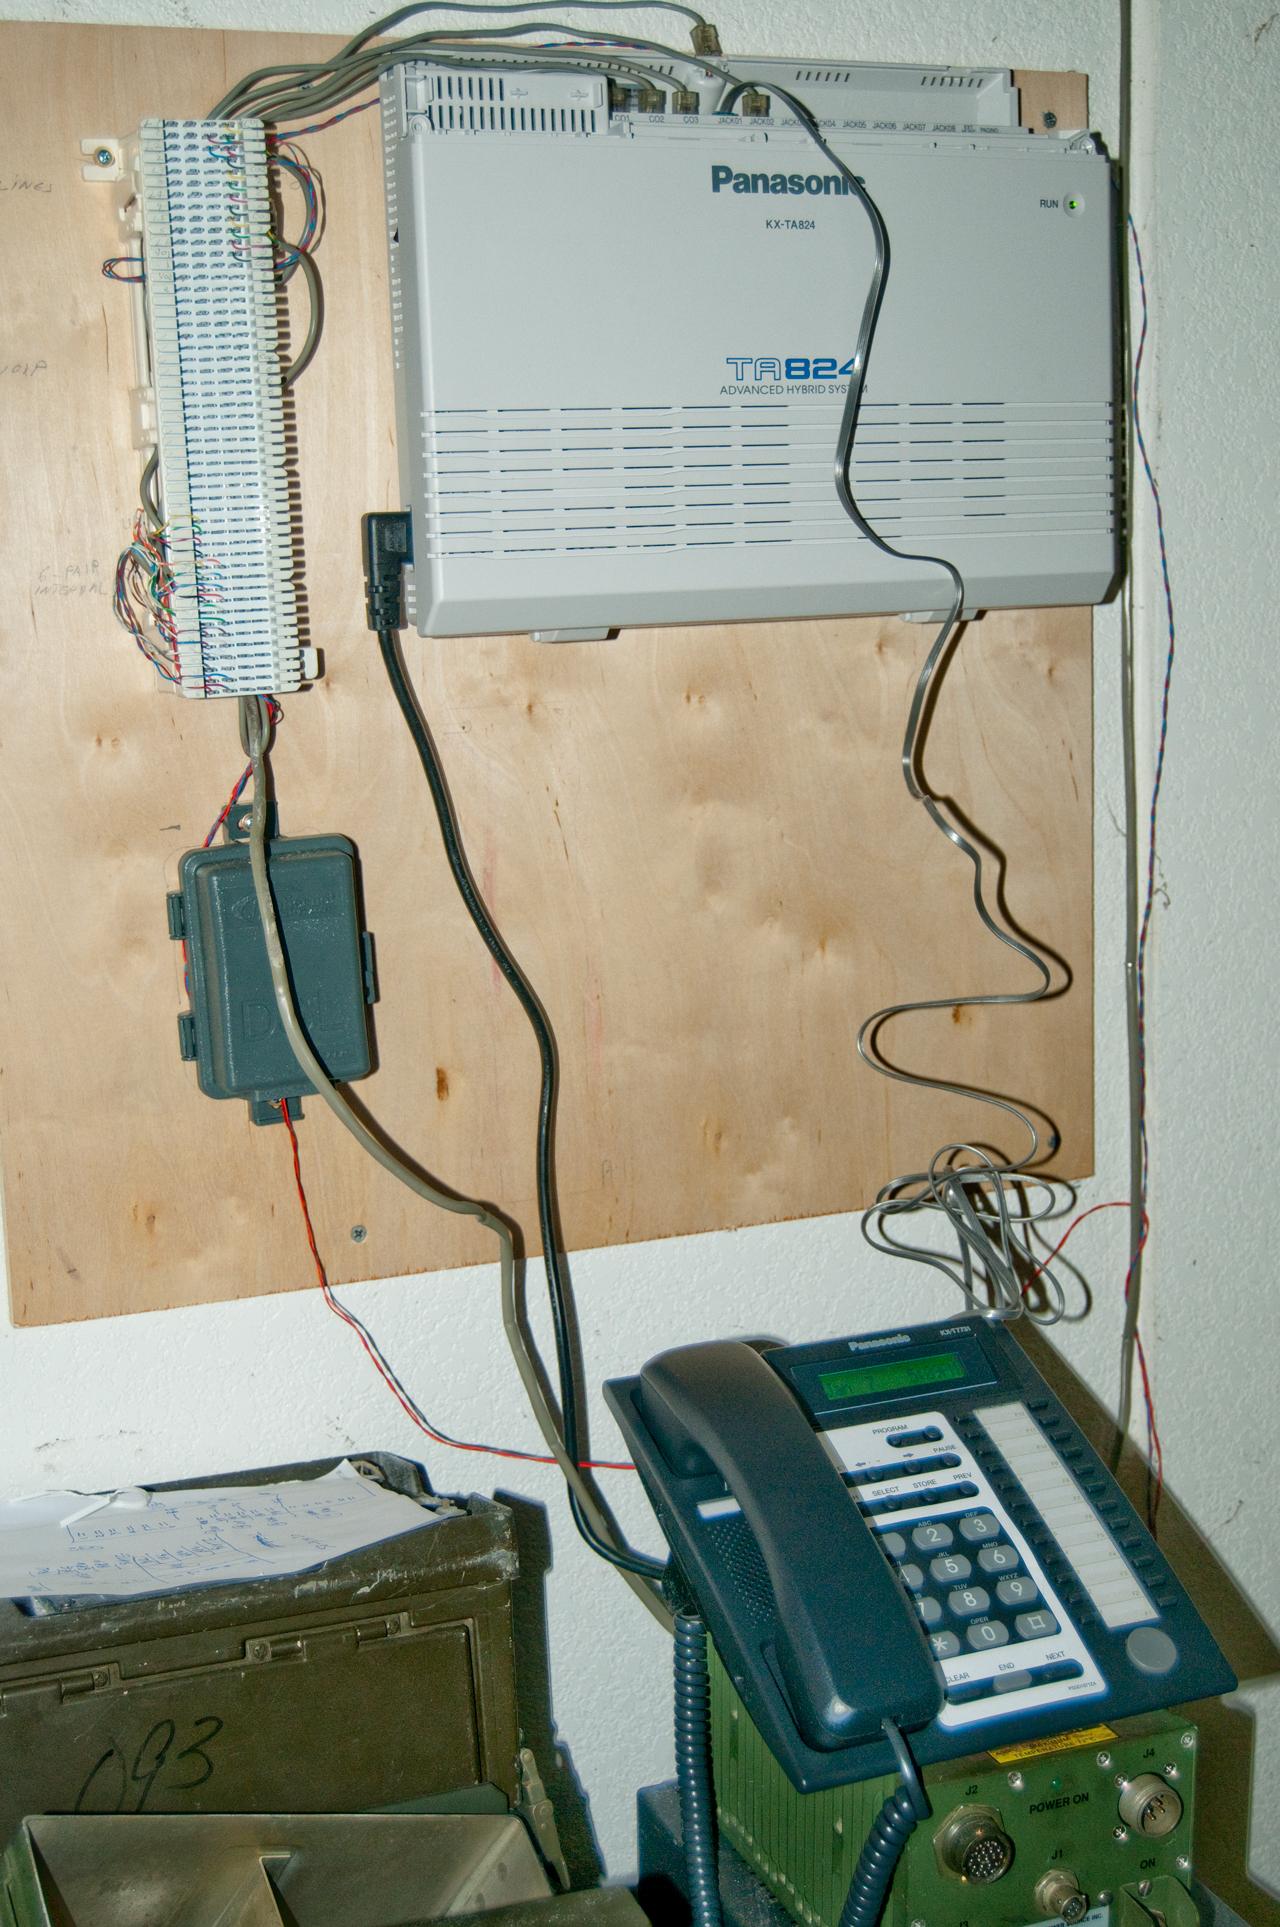 hight resolution of panasonic kx ta824 telephone system